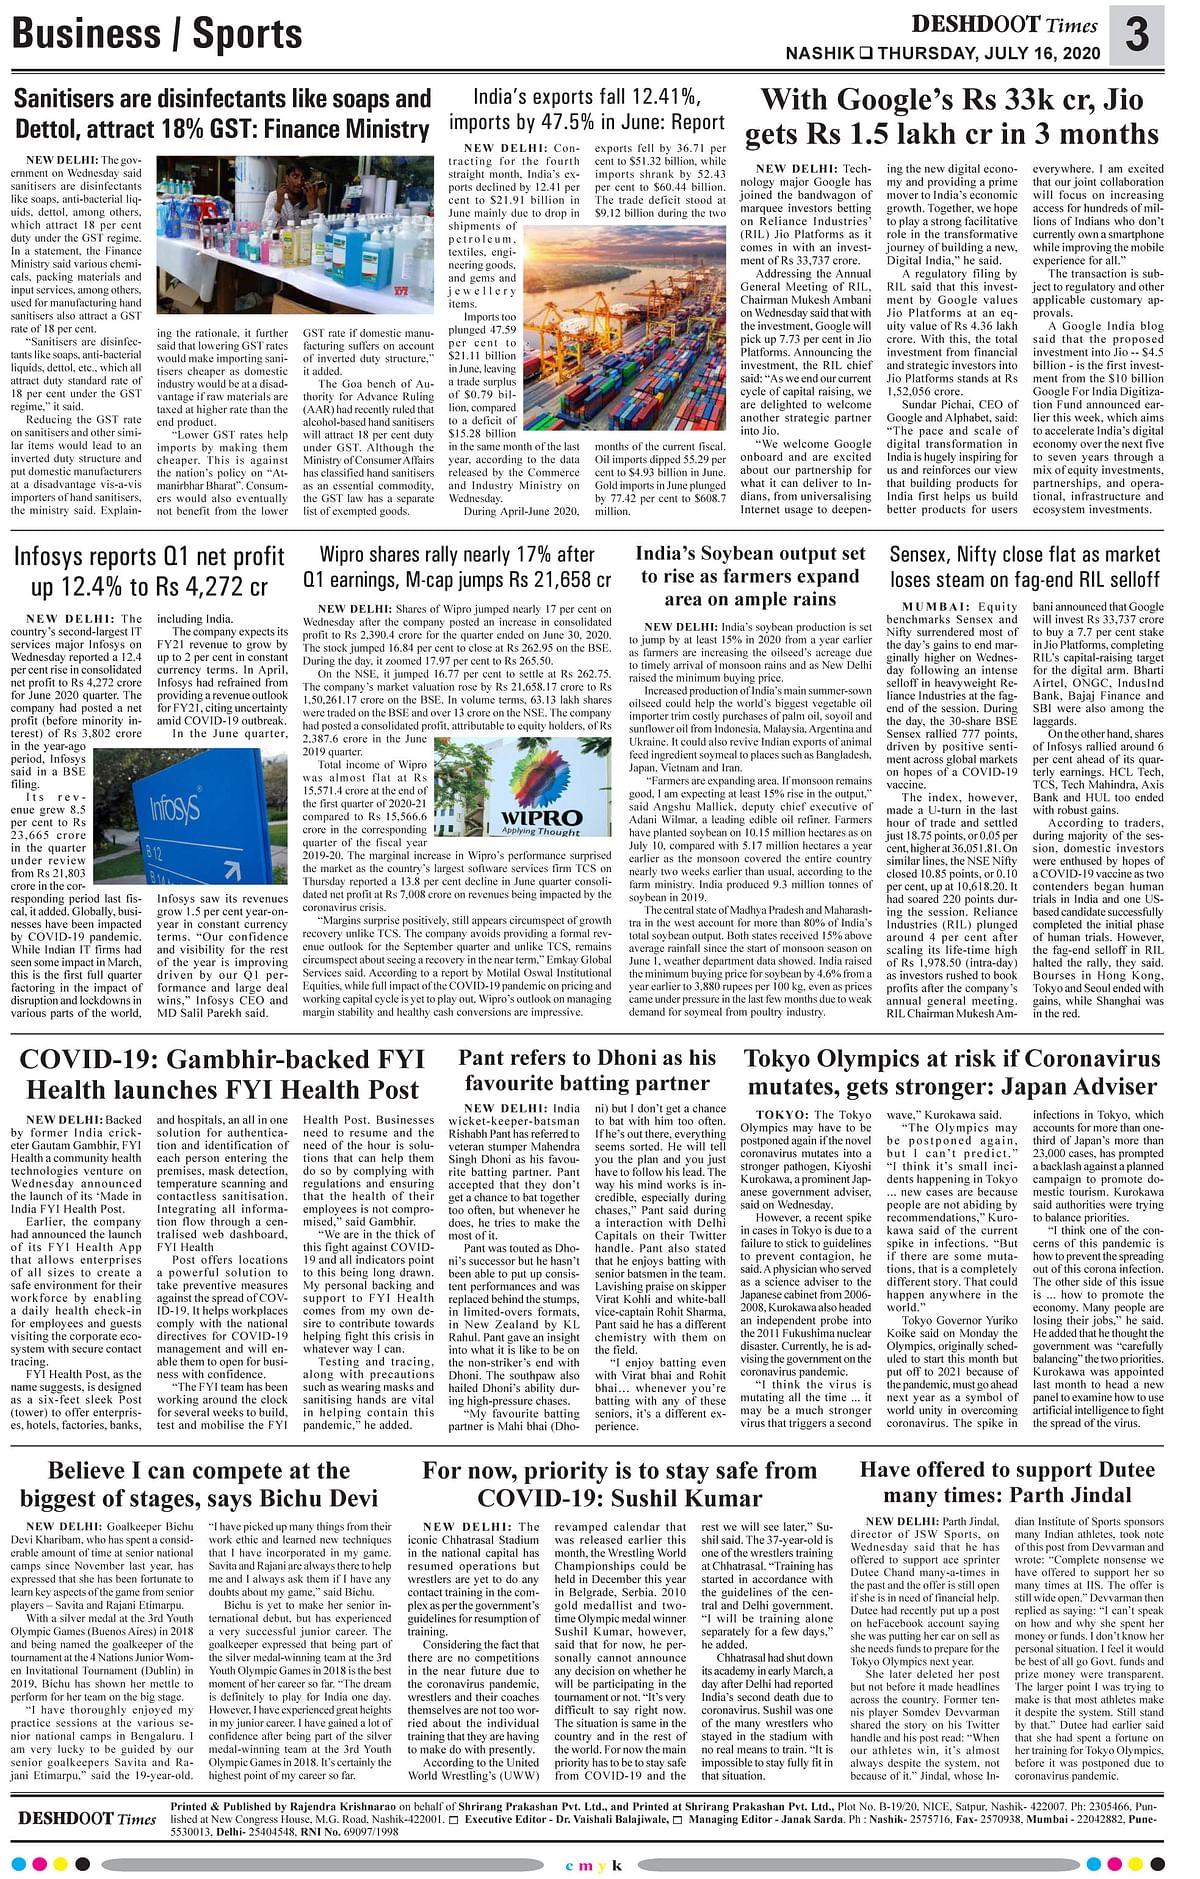 Deshdoot Times E Paper, 16 July 2020